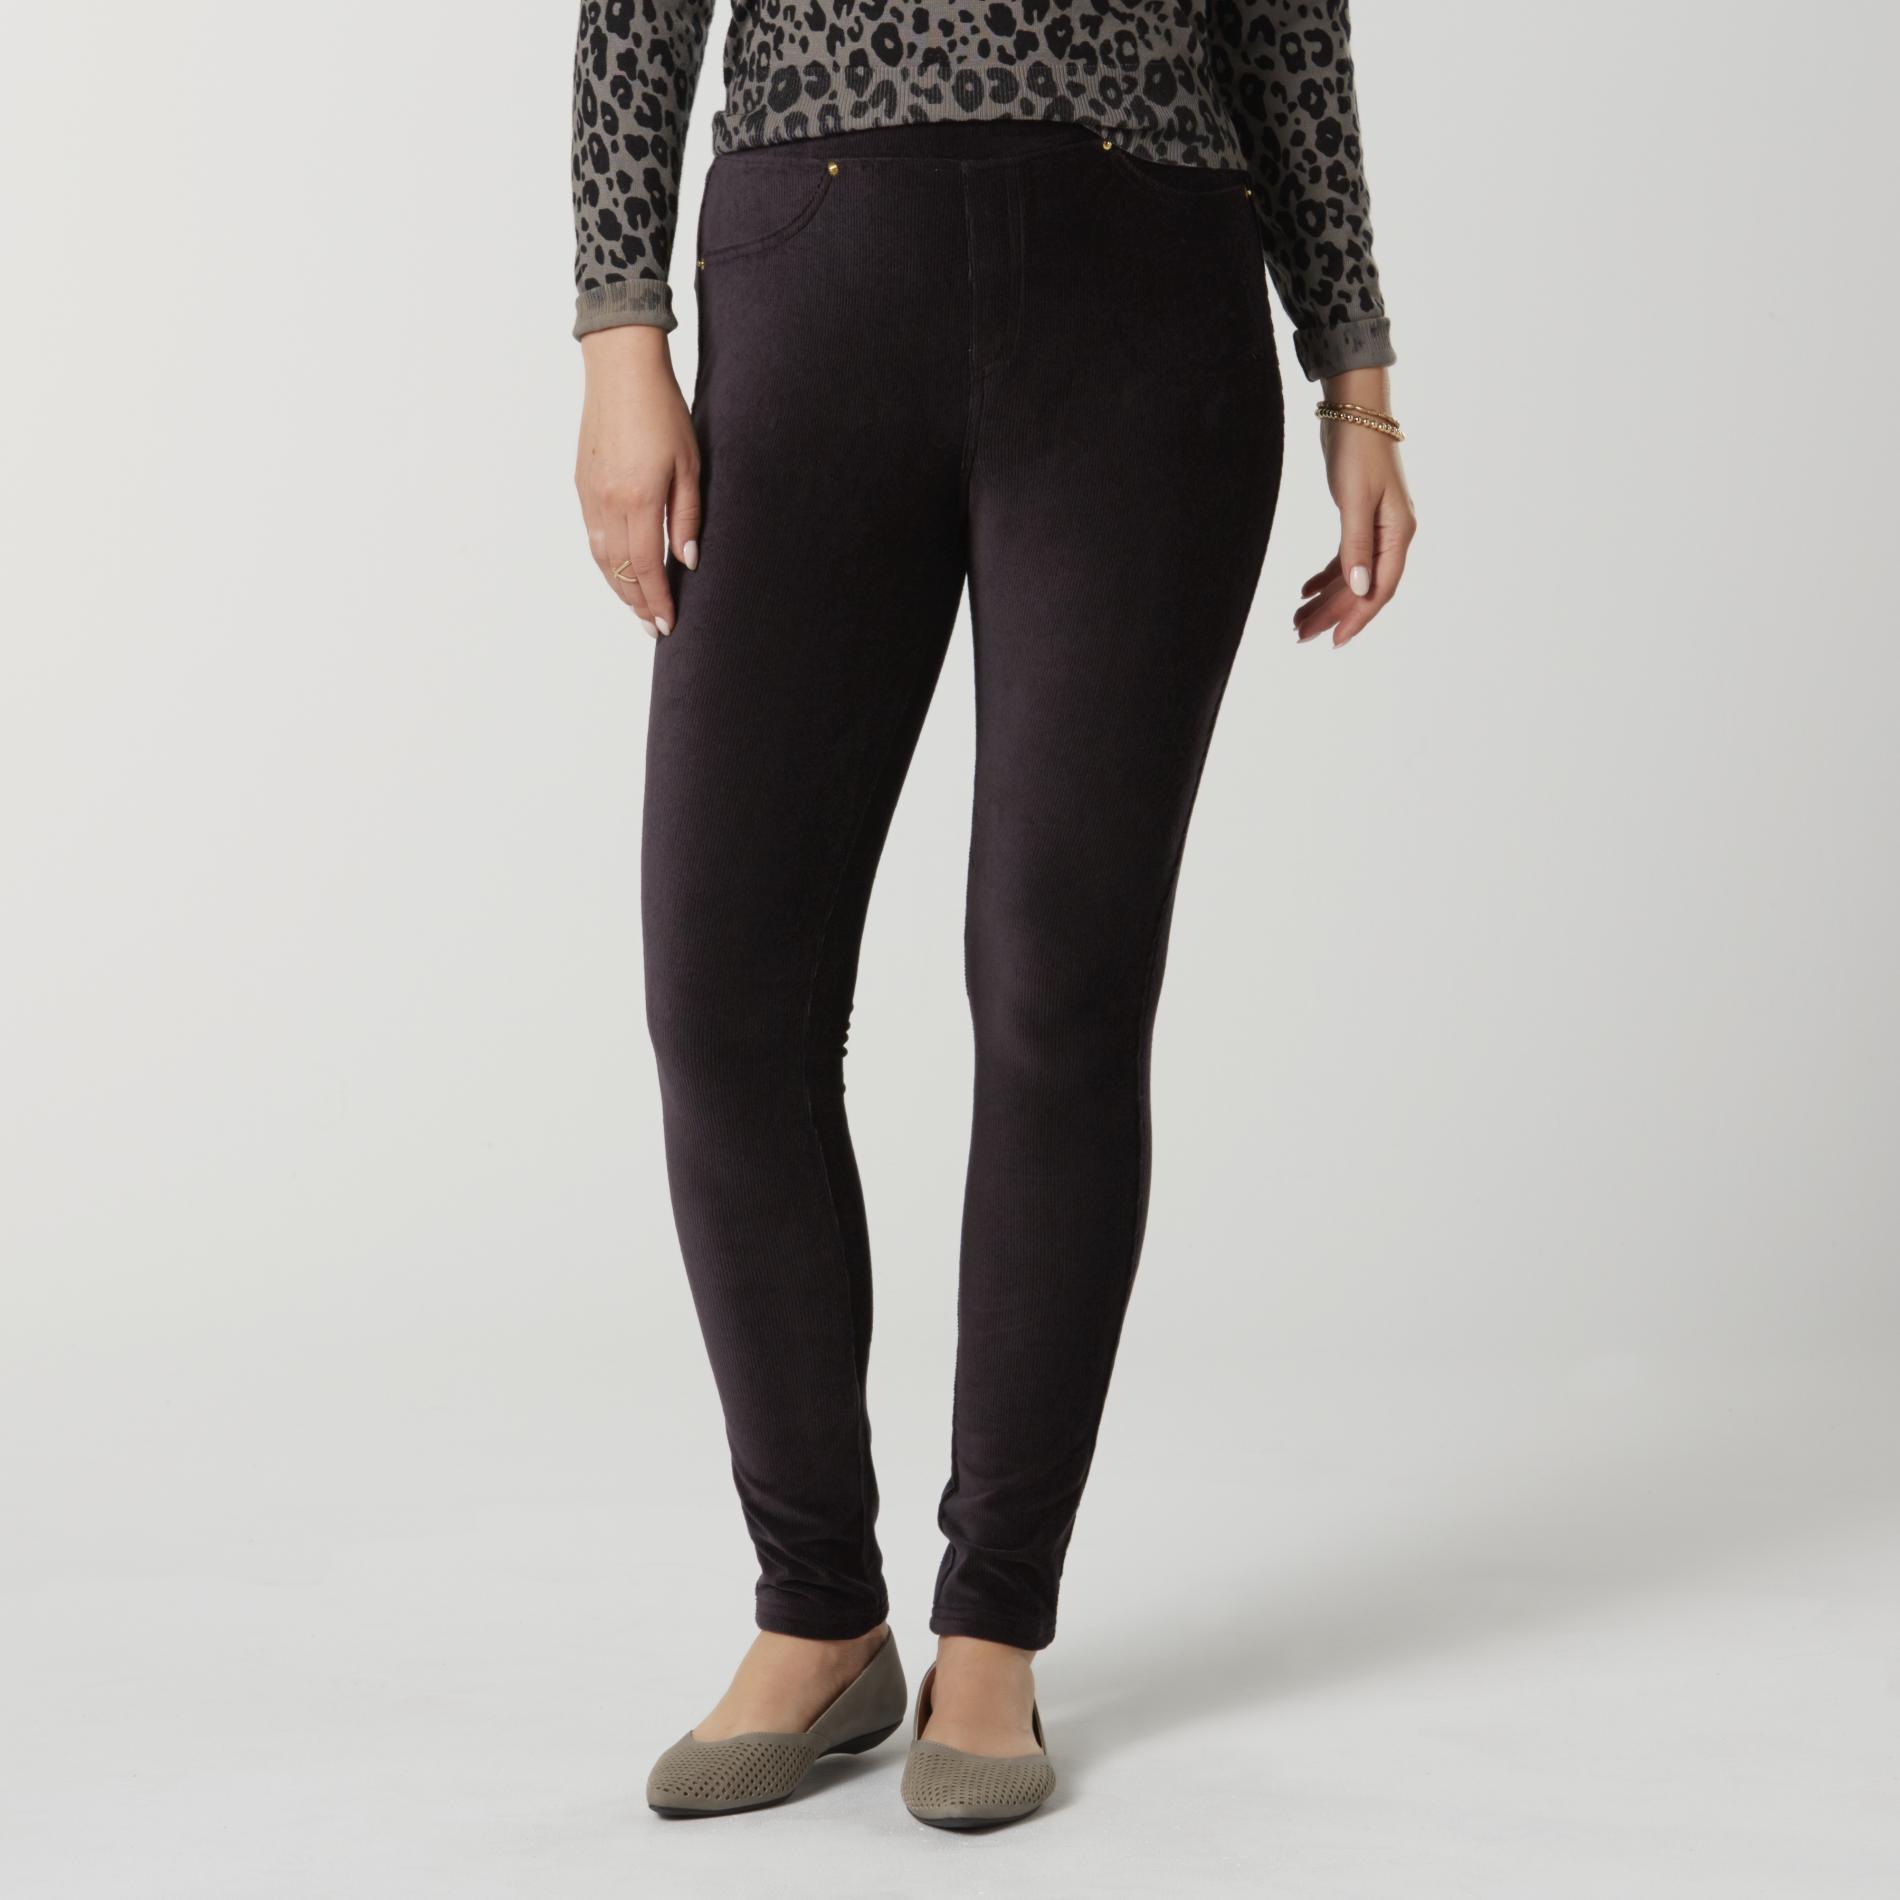 Basic Editions Women' Corduroy Leggings